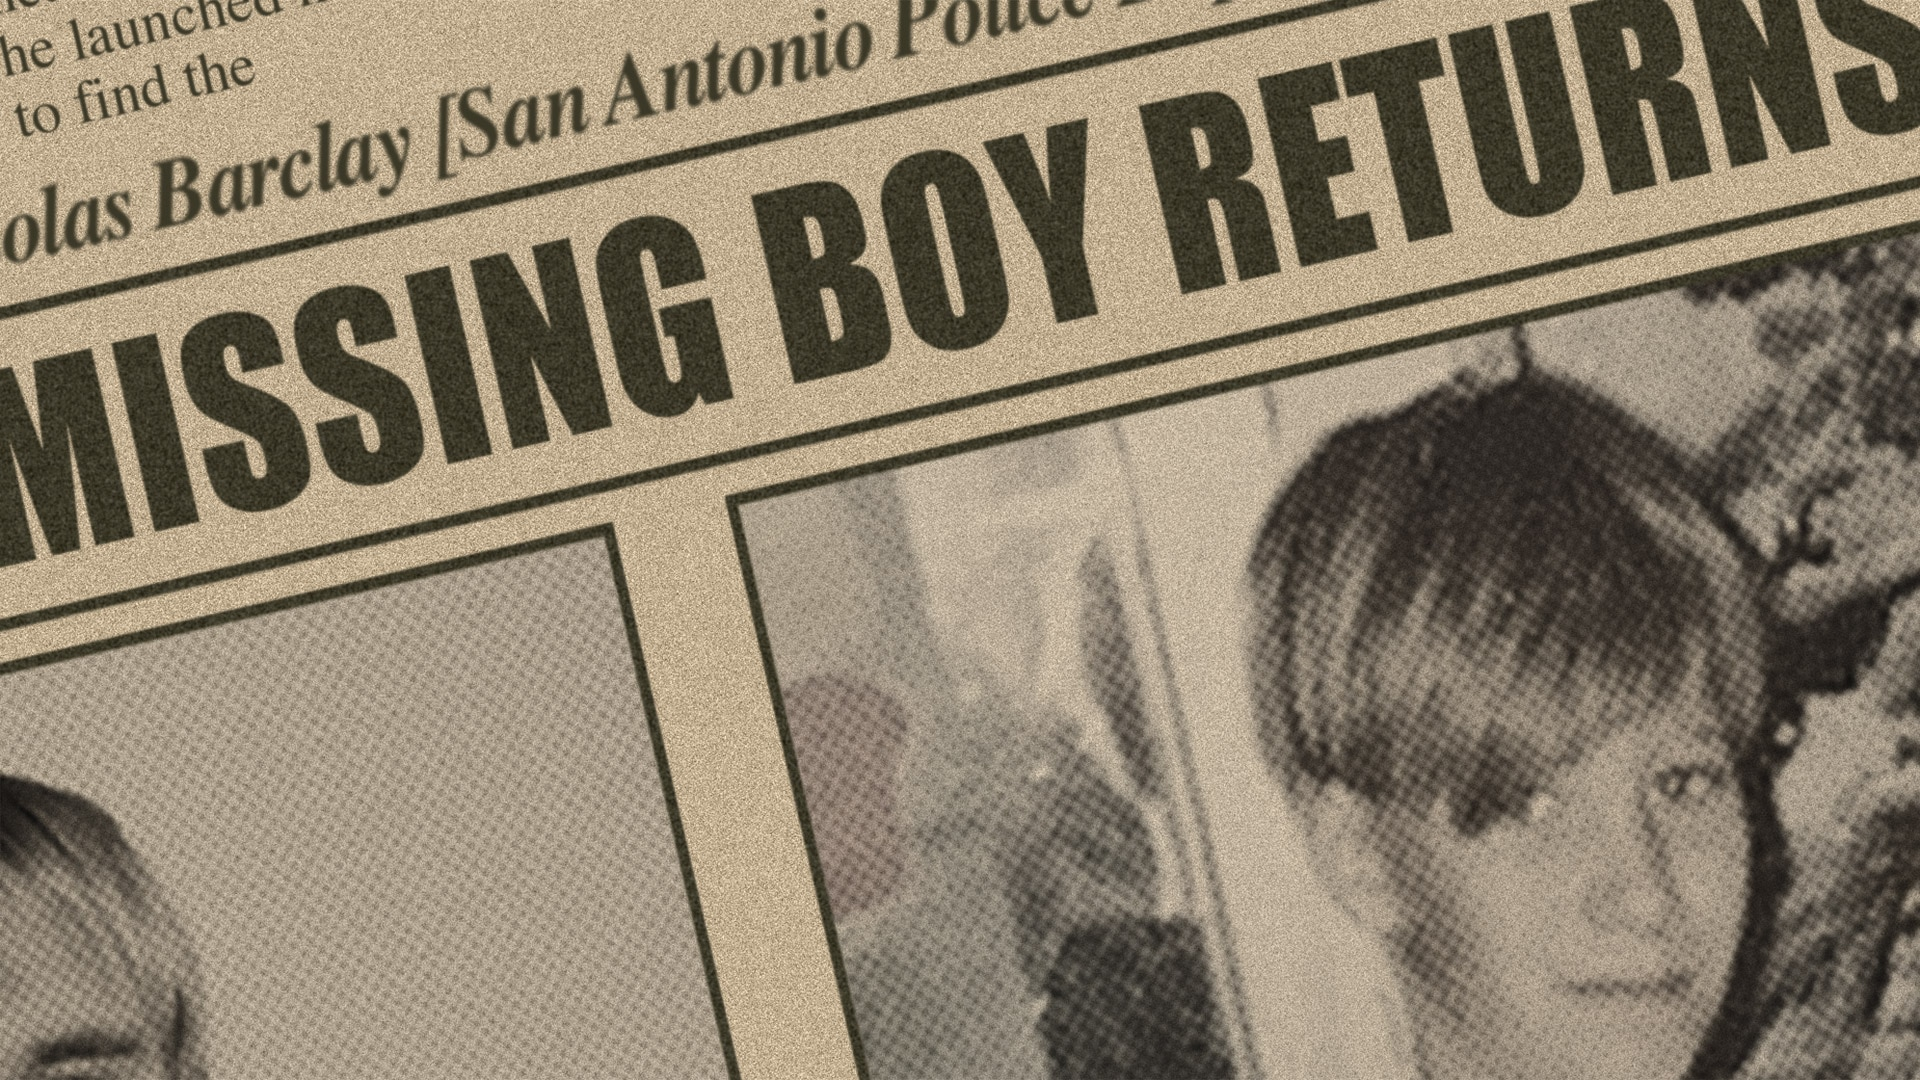 Missing boy returns